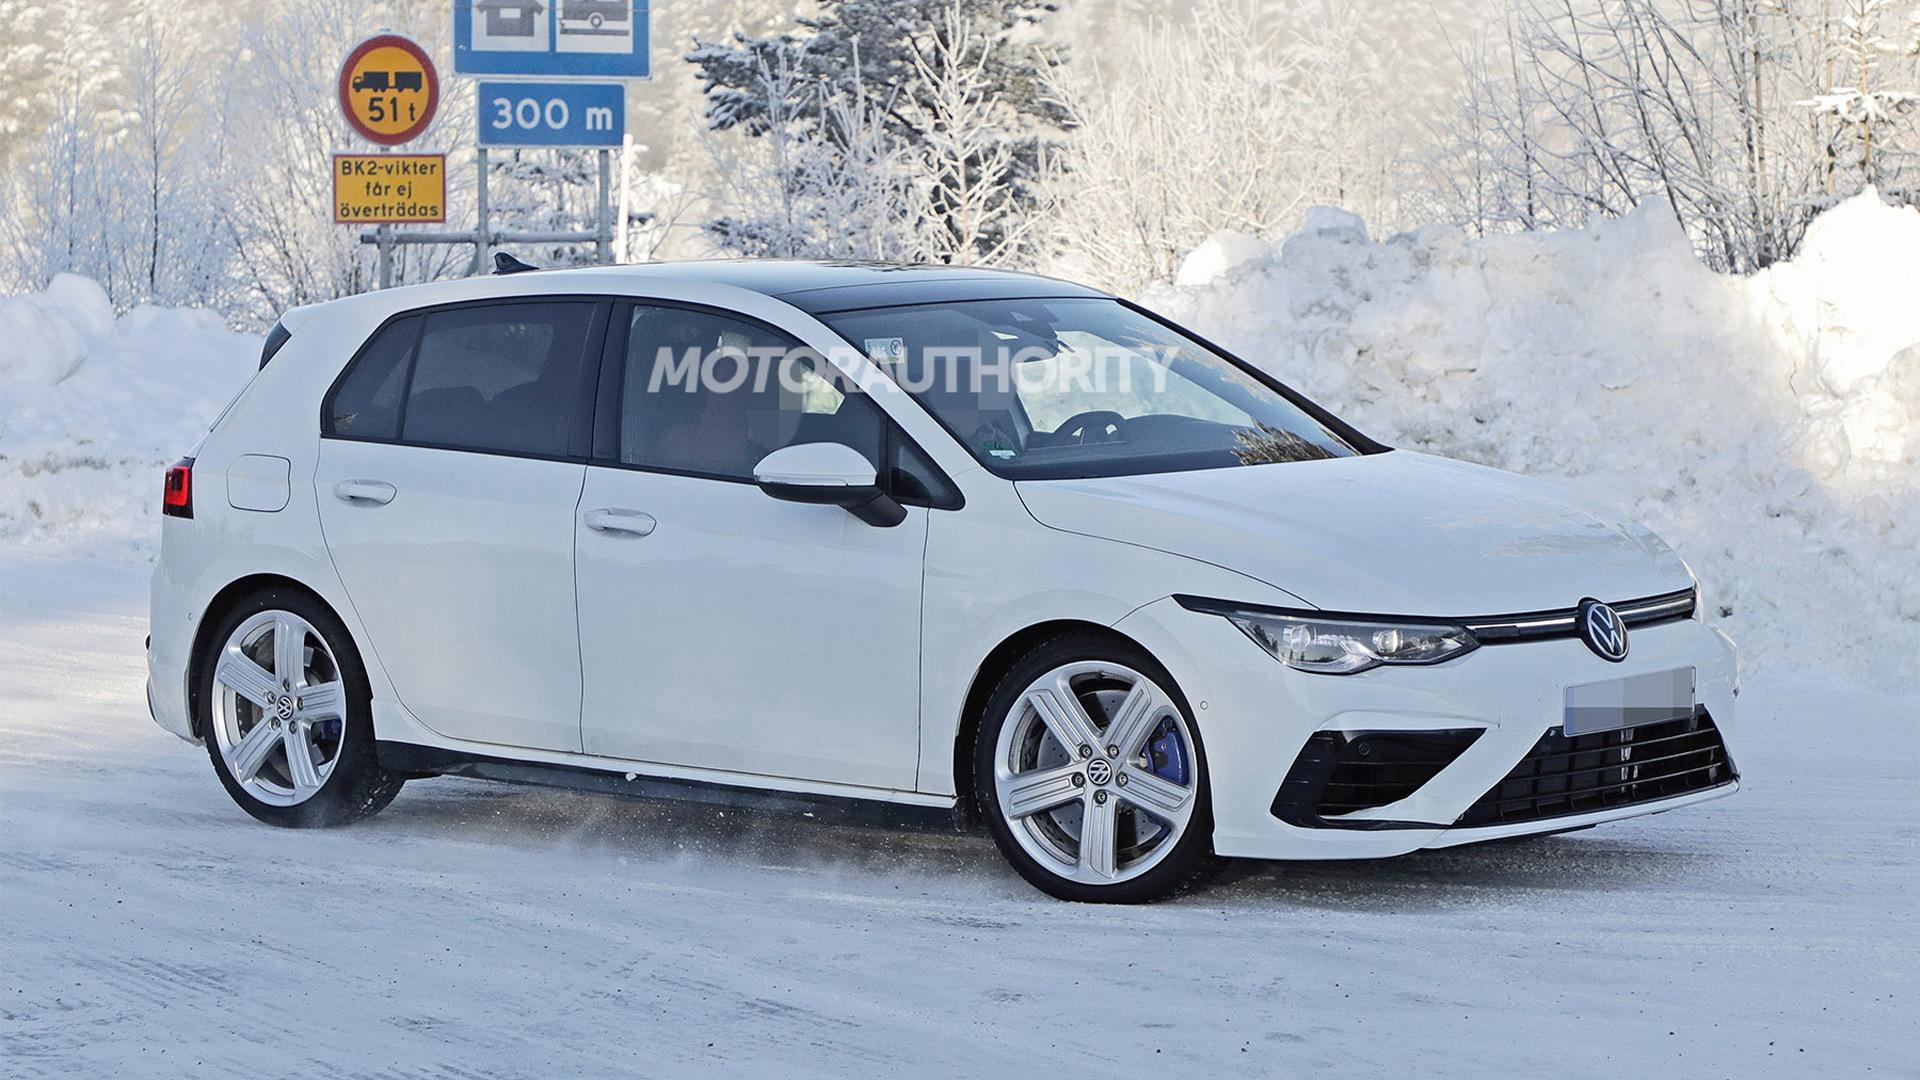 2021 Volkswagen Golf R spy shots - Photo credit:S. Baldauf/SB-Medien